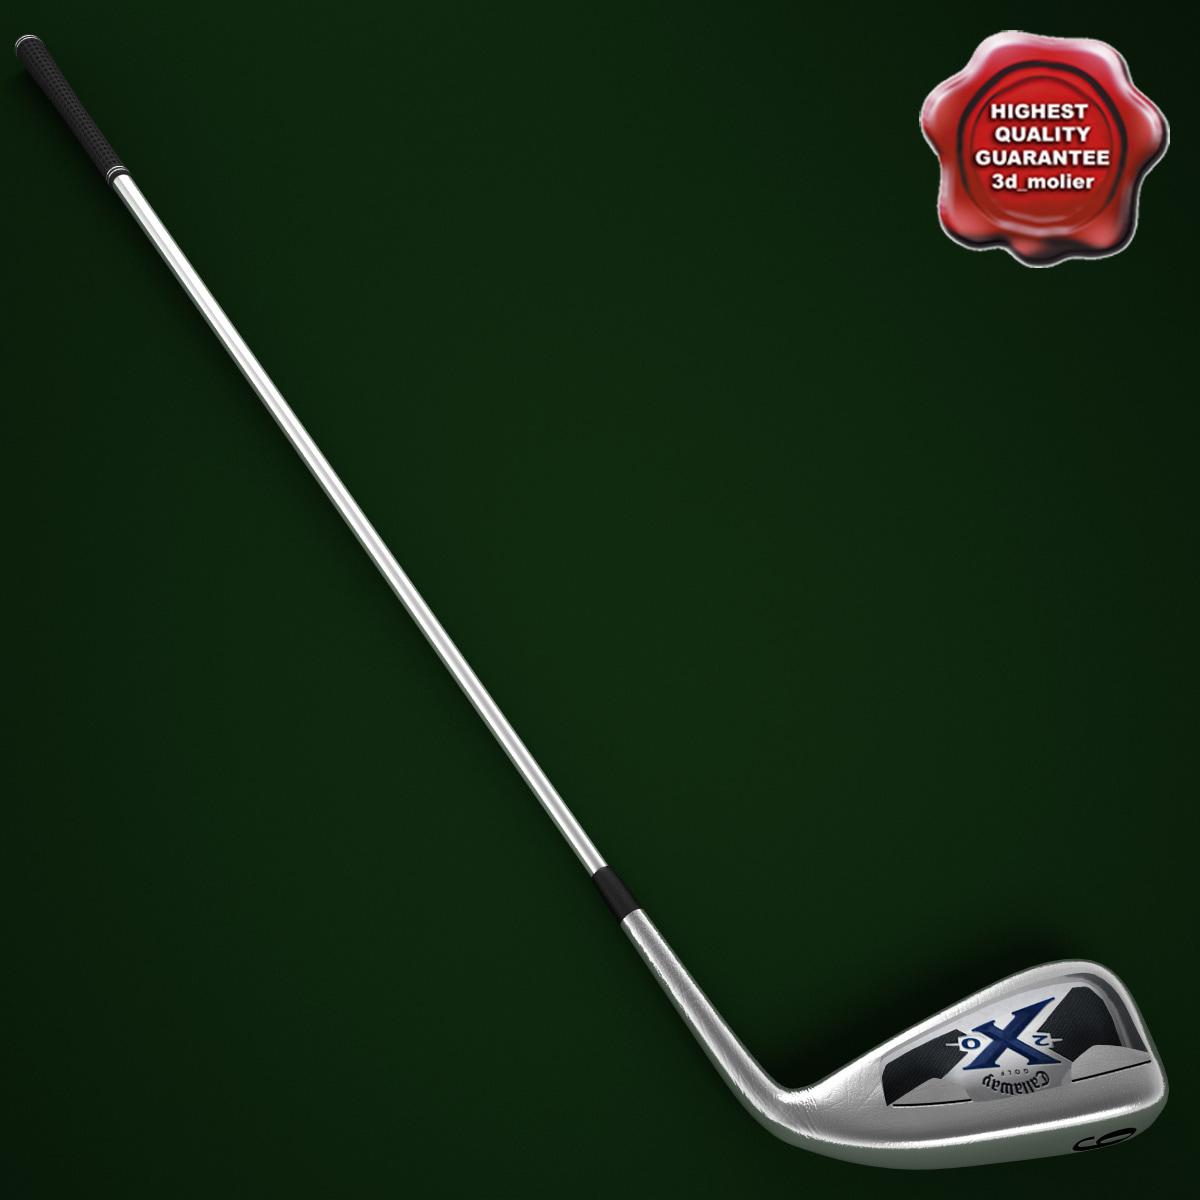 Golf_Callaway_X-20_Iron_00.jpg